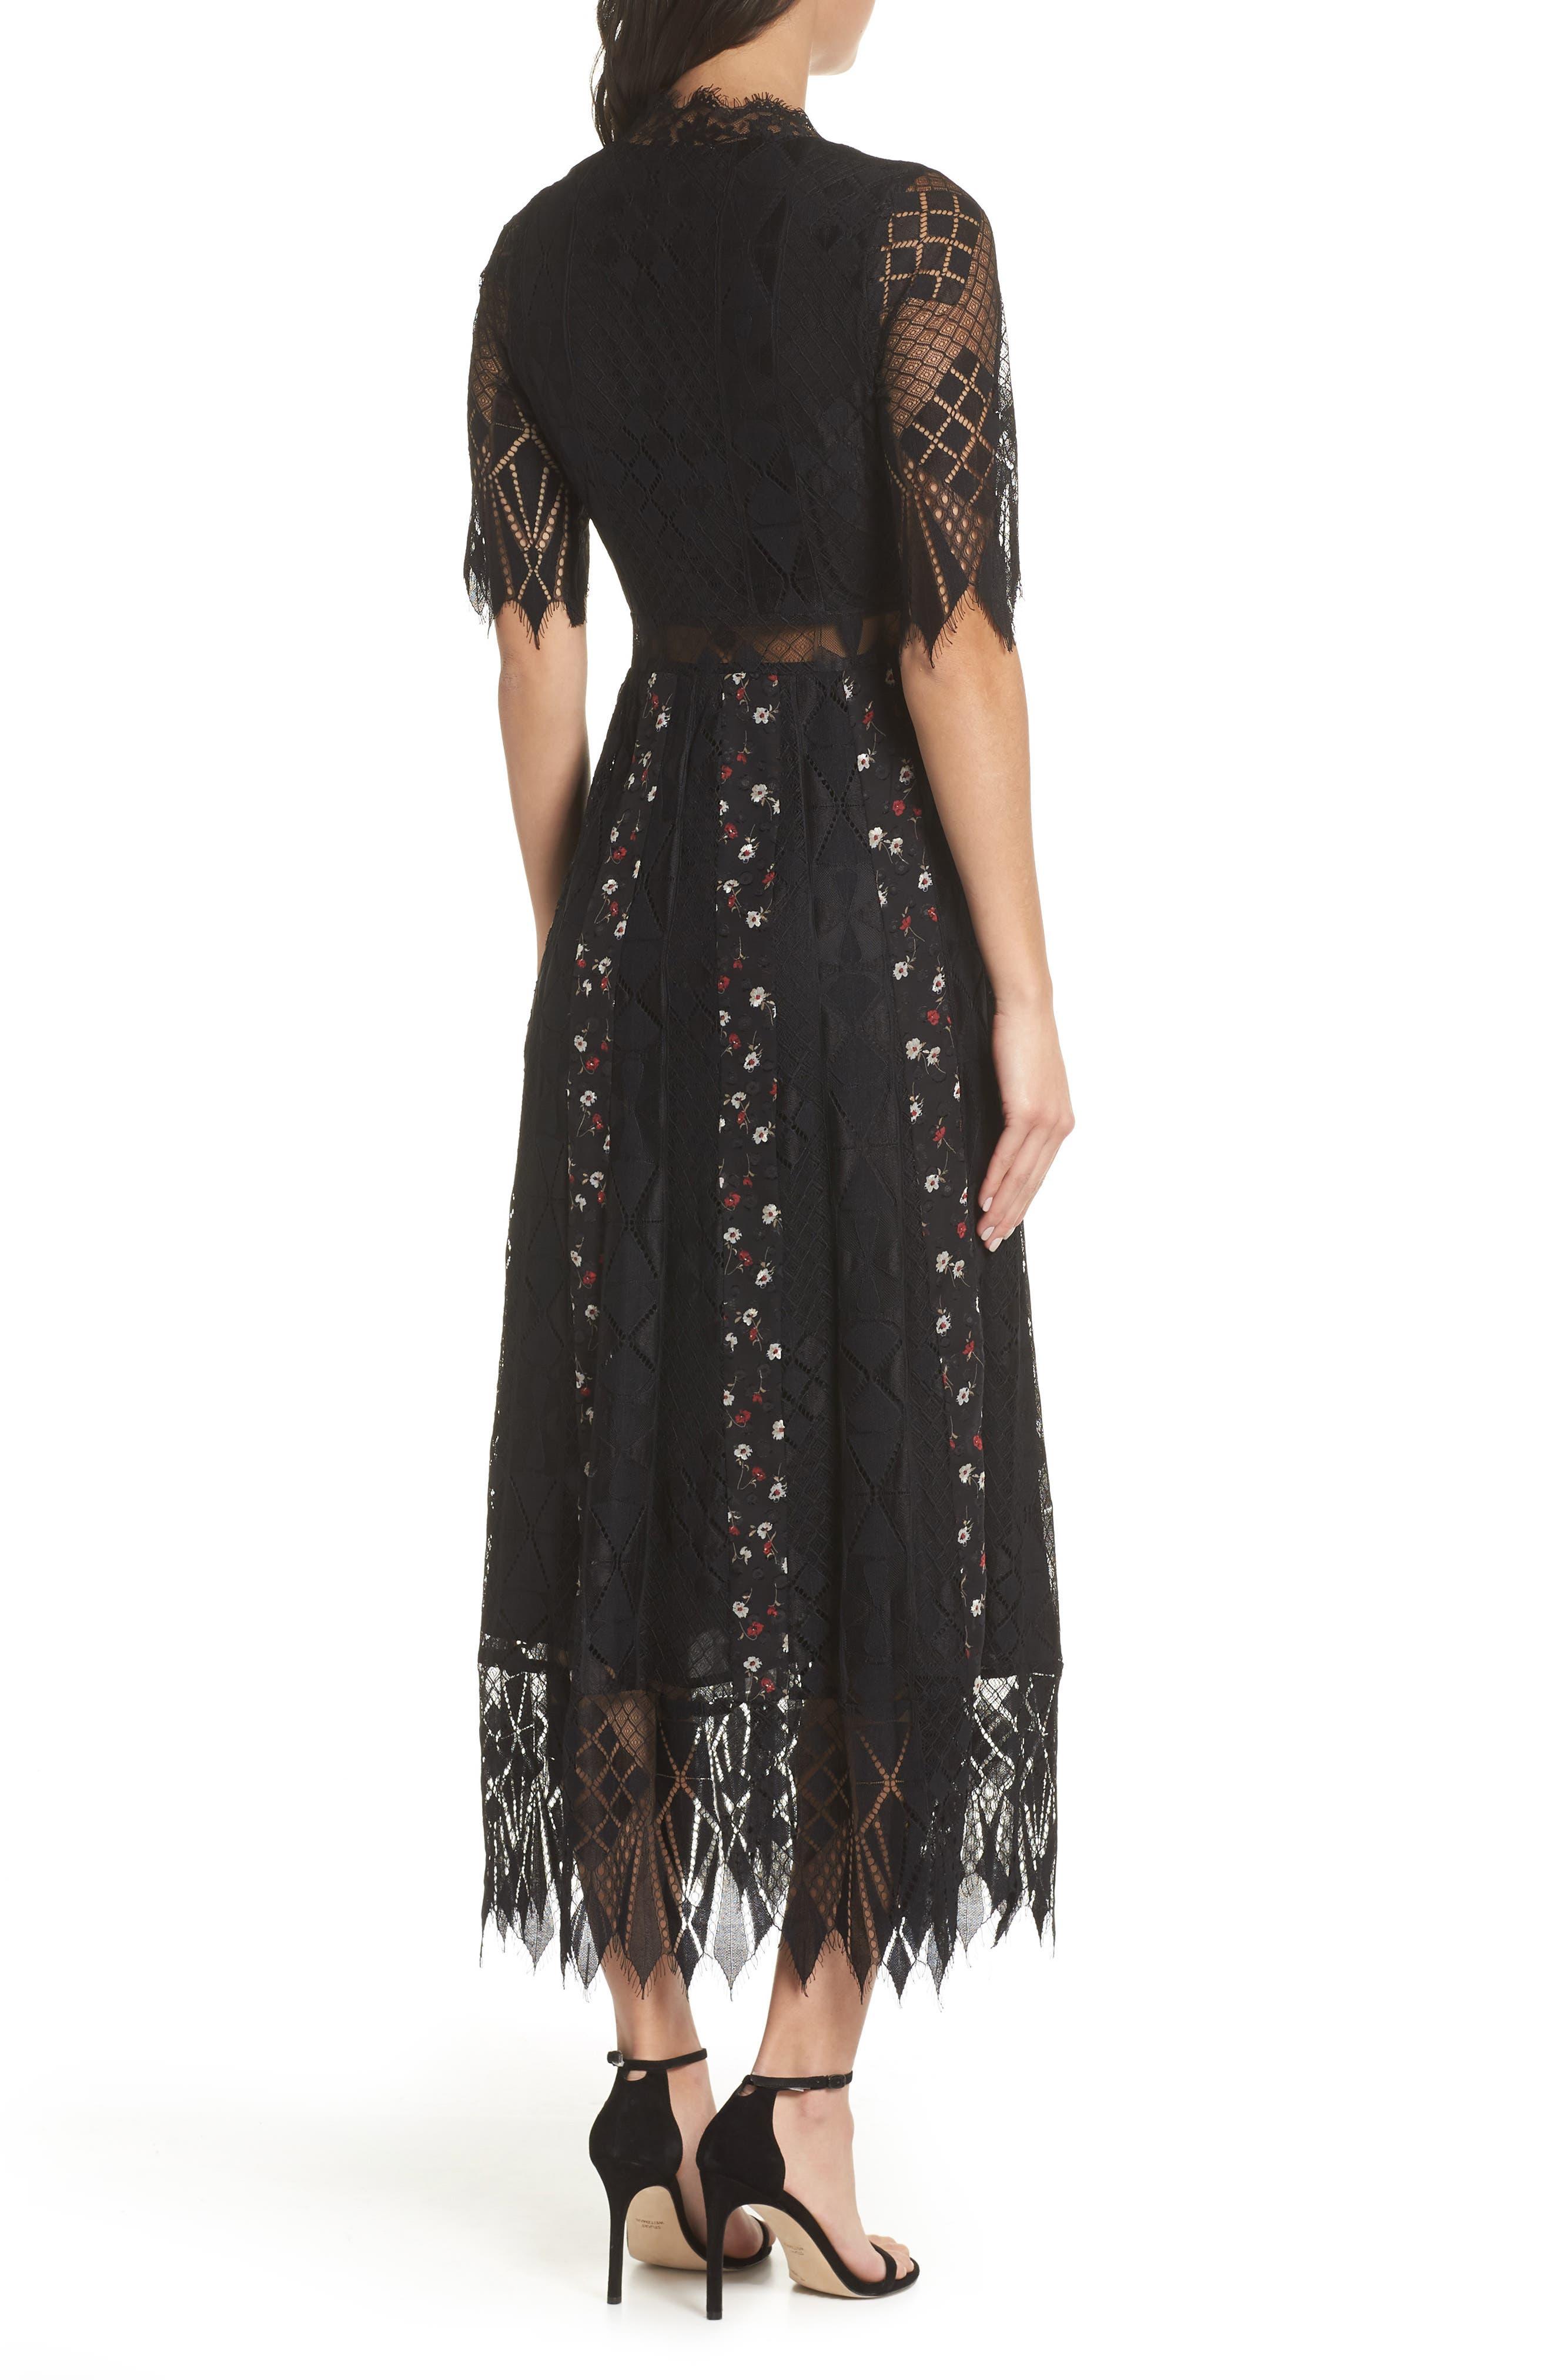 FOXIEDOX, Josefine Lace & Clip Dot Tea Length Dress, Alternate thumbnail 2, color, 001